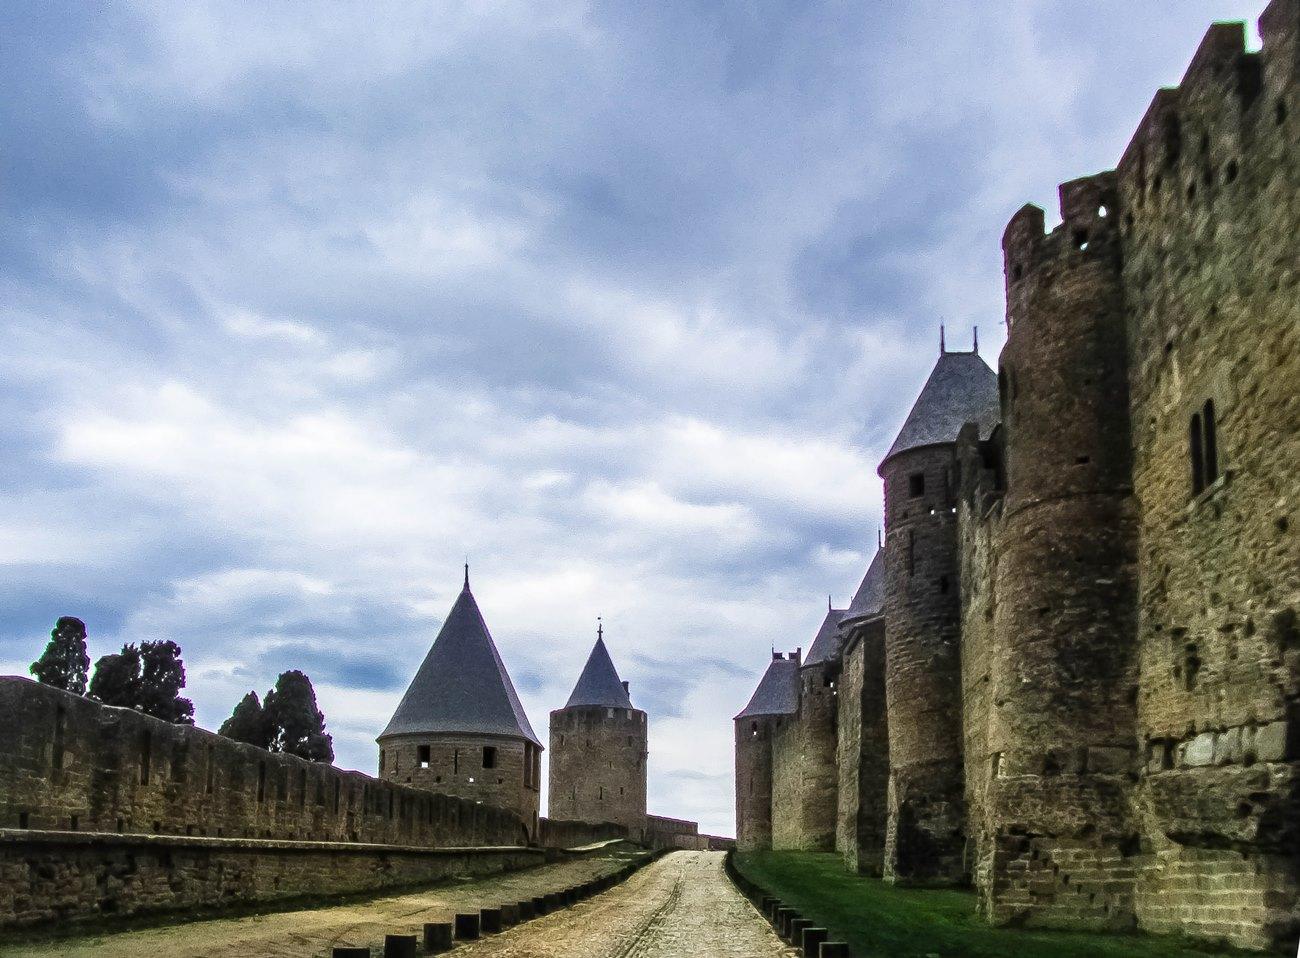 irina-fortuna-Carcassonne-france 03.jpg